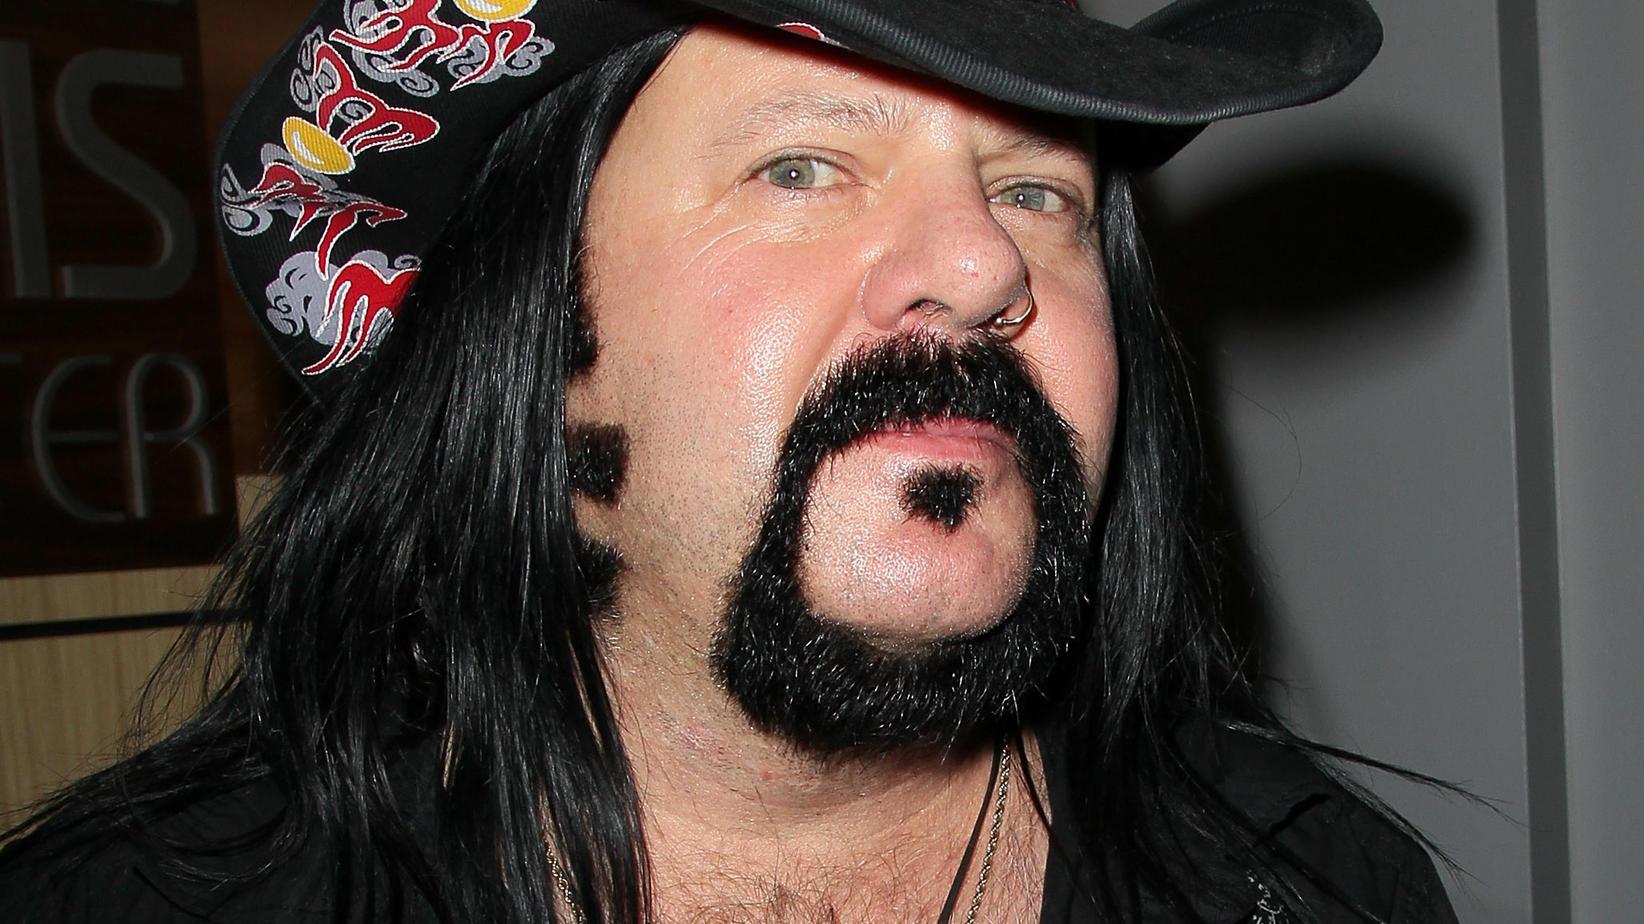 Trauer in der Metal-Szene: Ex-Pantera-Drummer Vinnie Paul ist tot